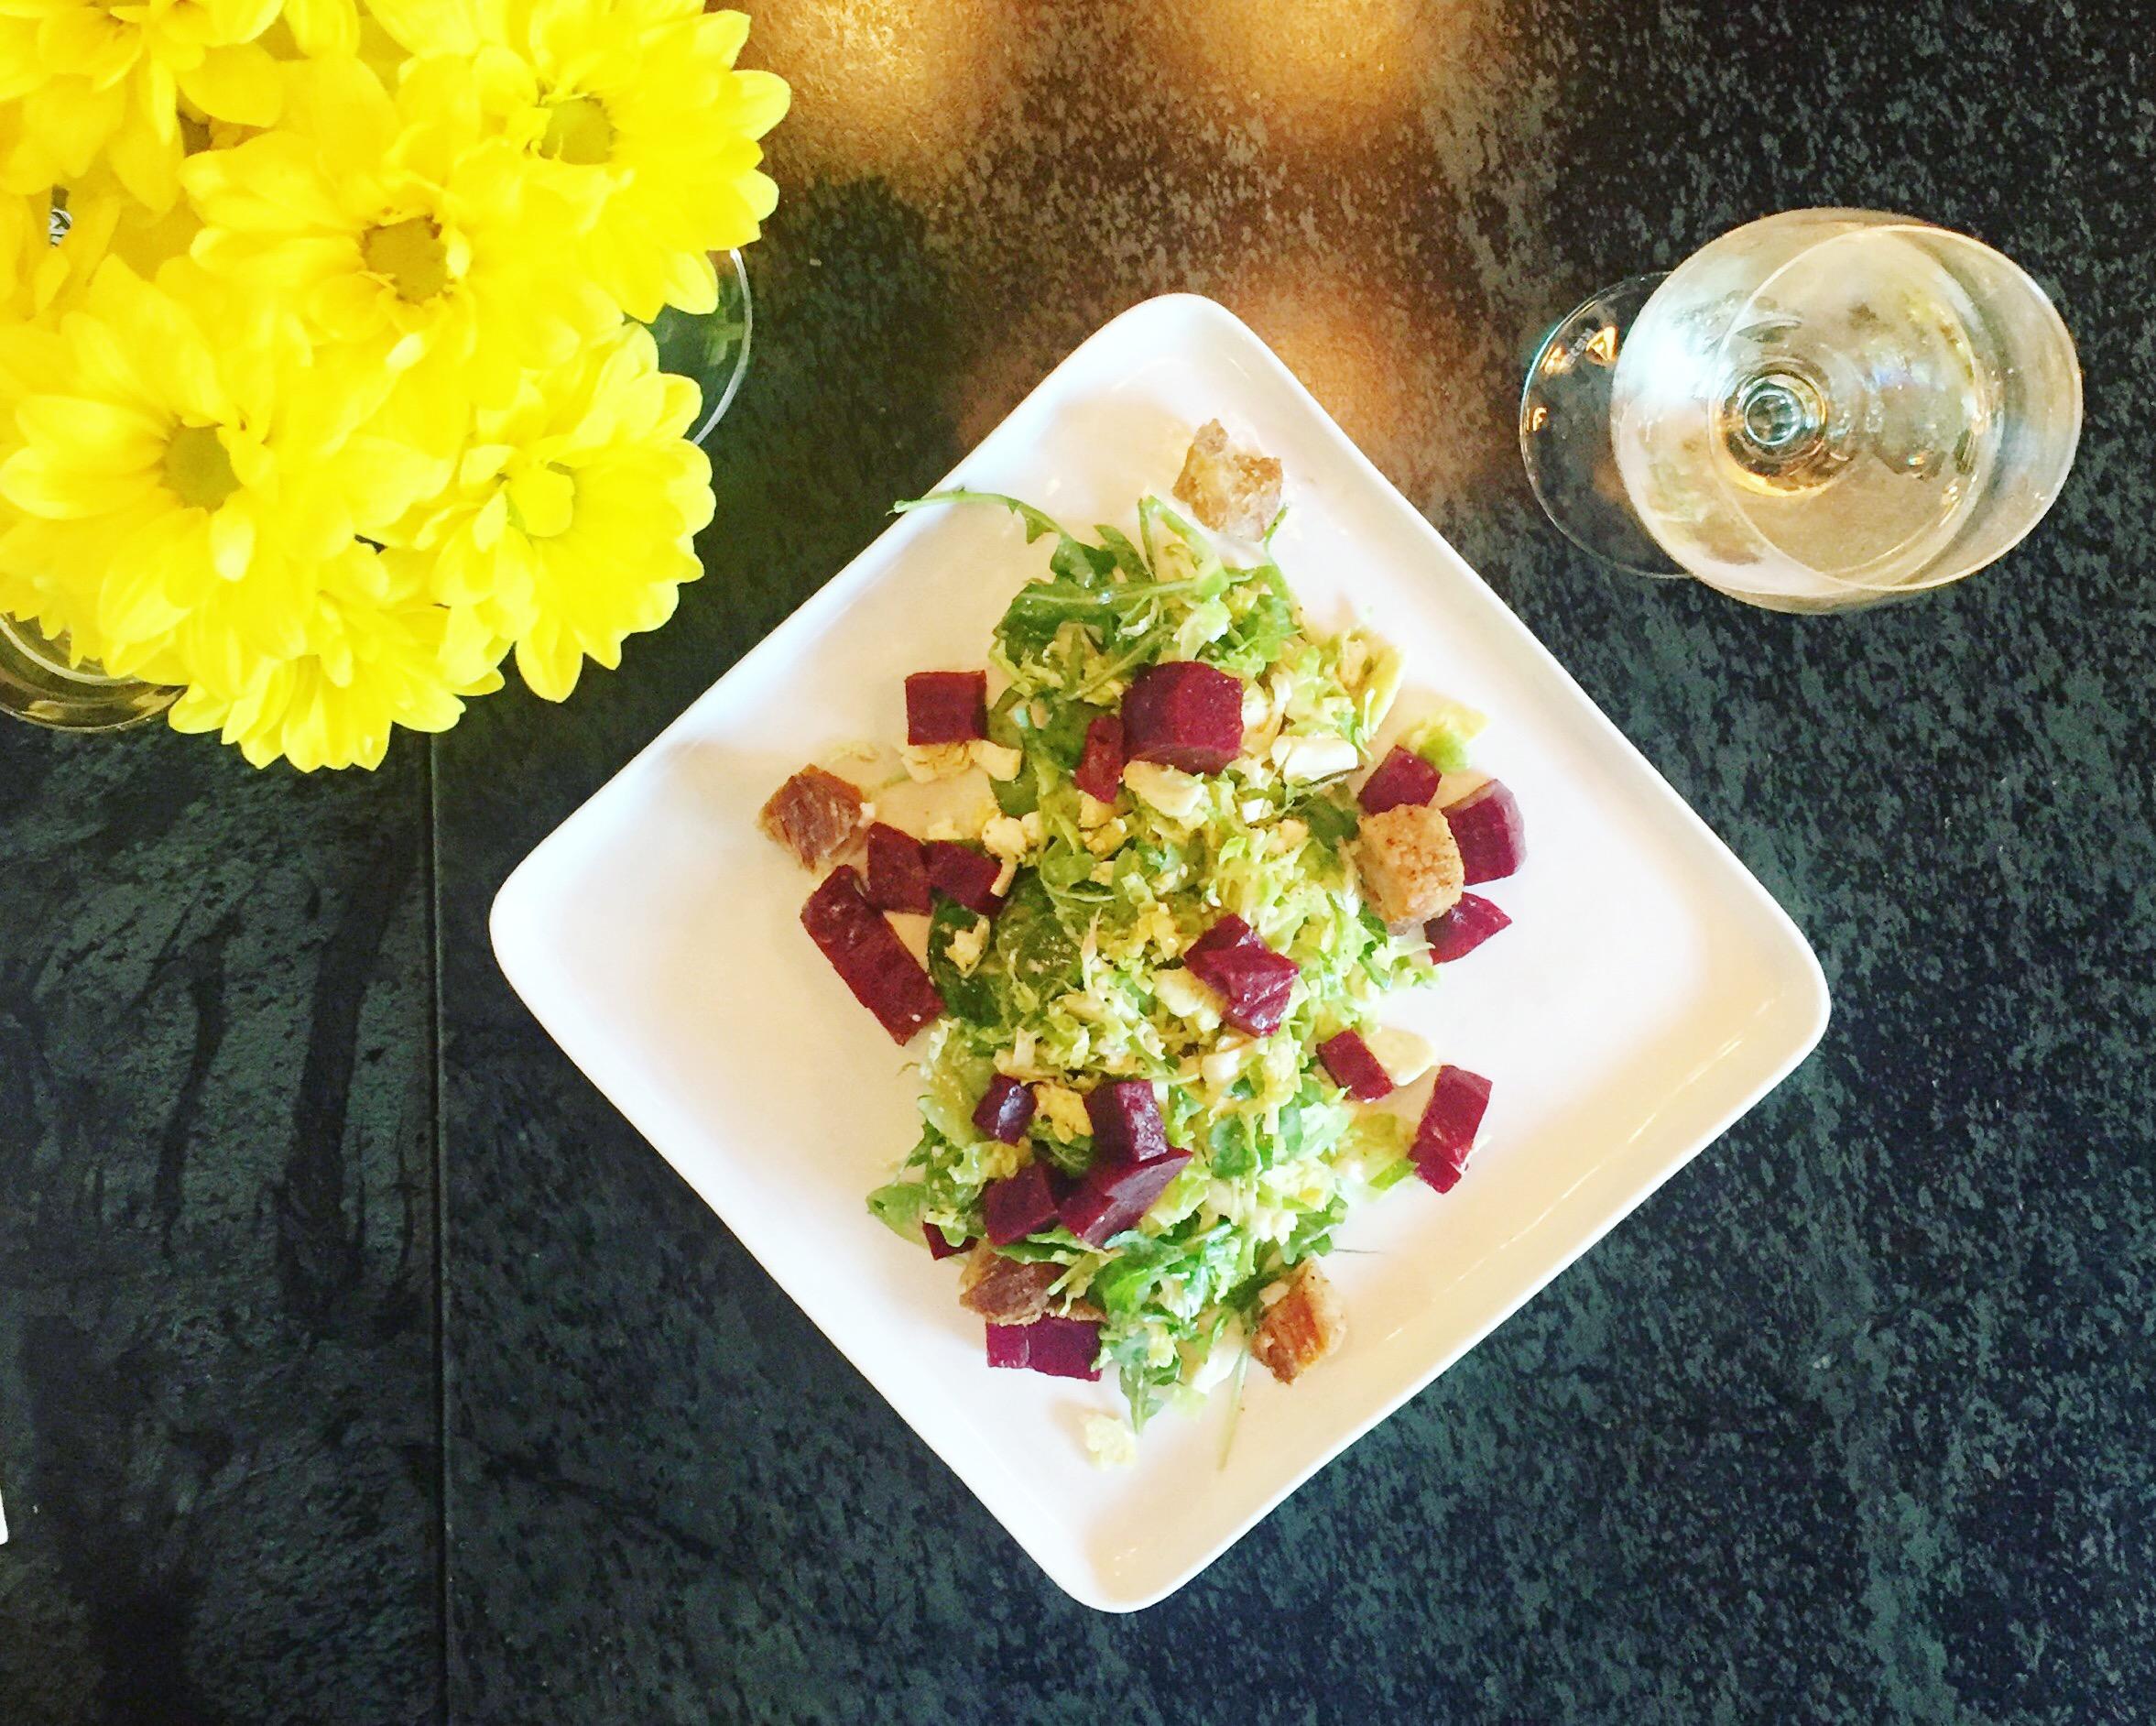 Beet Salad @ Reid's Fine Food   Beets, shaved brussels, arugula, lardon, goat cheese, and truffle vinaigrette.